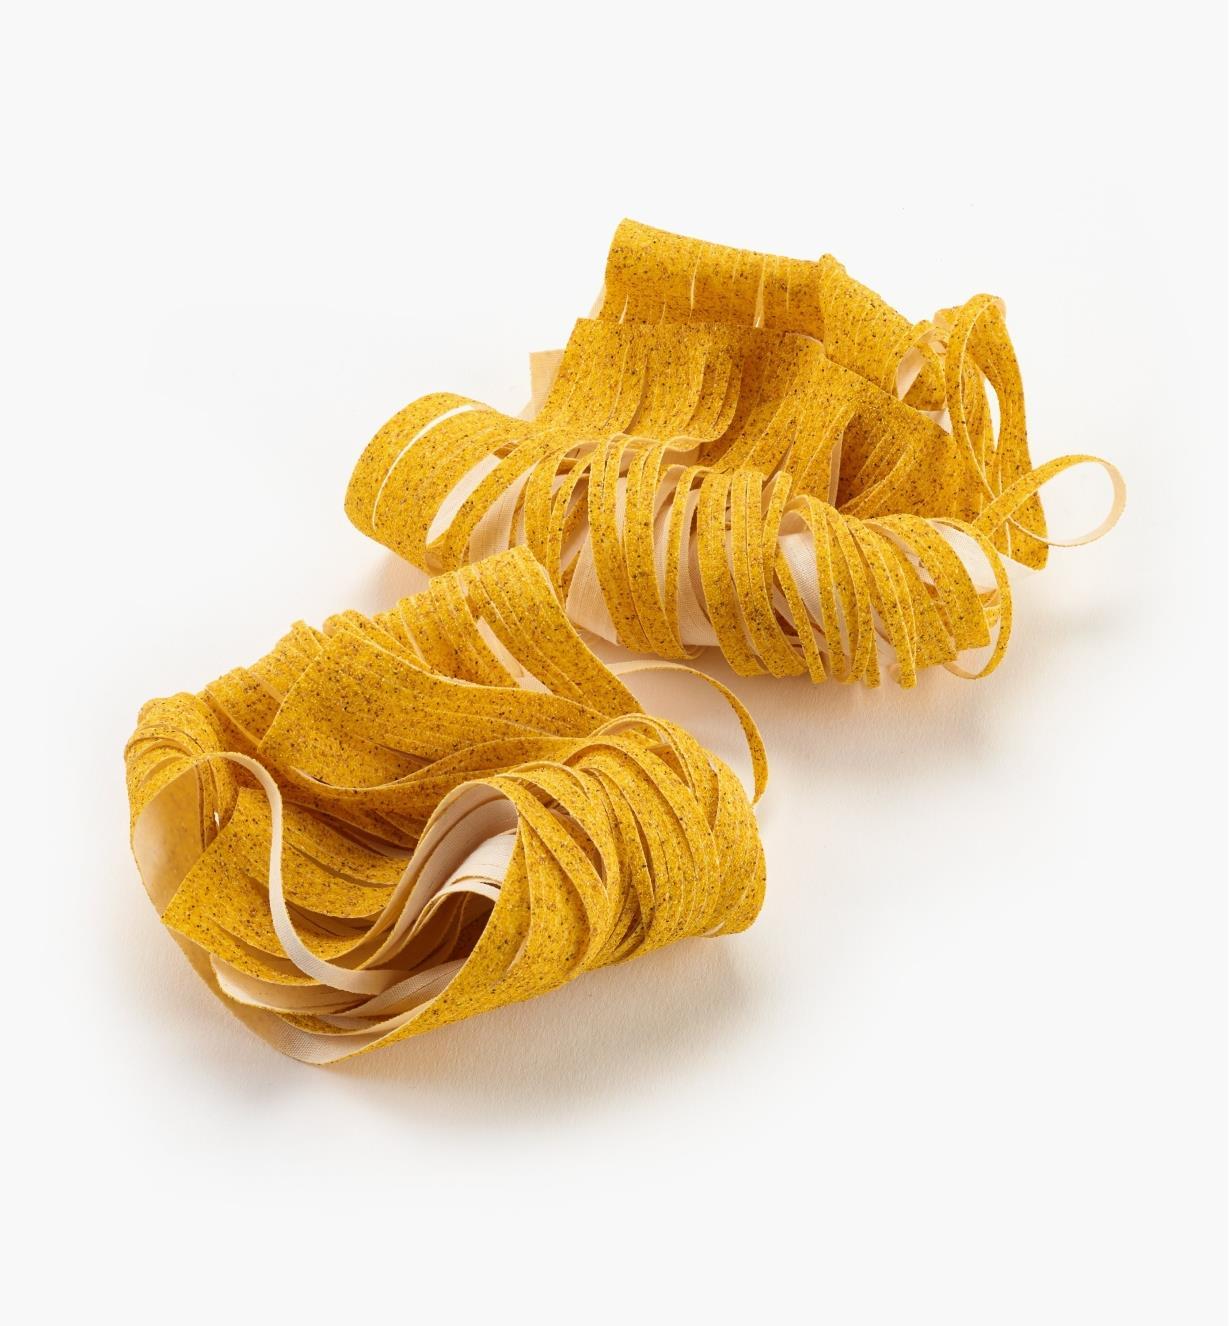 09A0347 - Spaghetti Scrub, pkg of 2